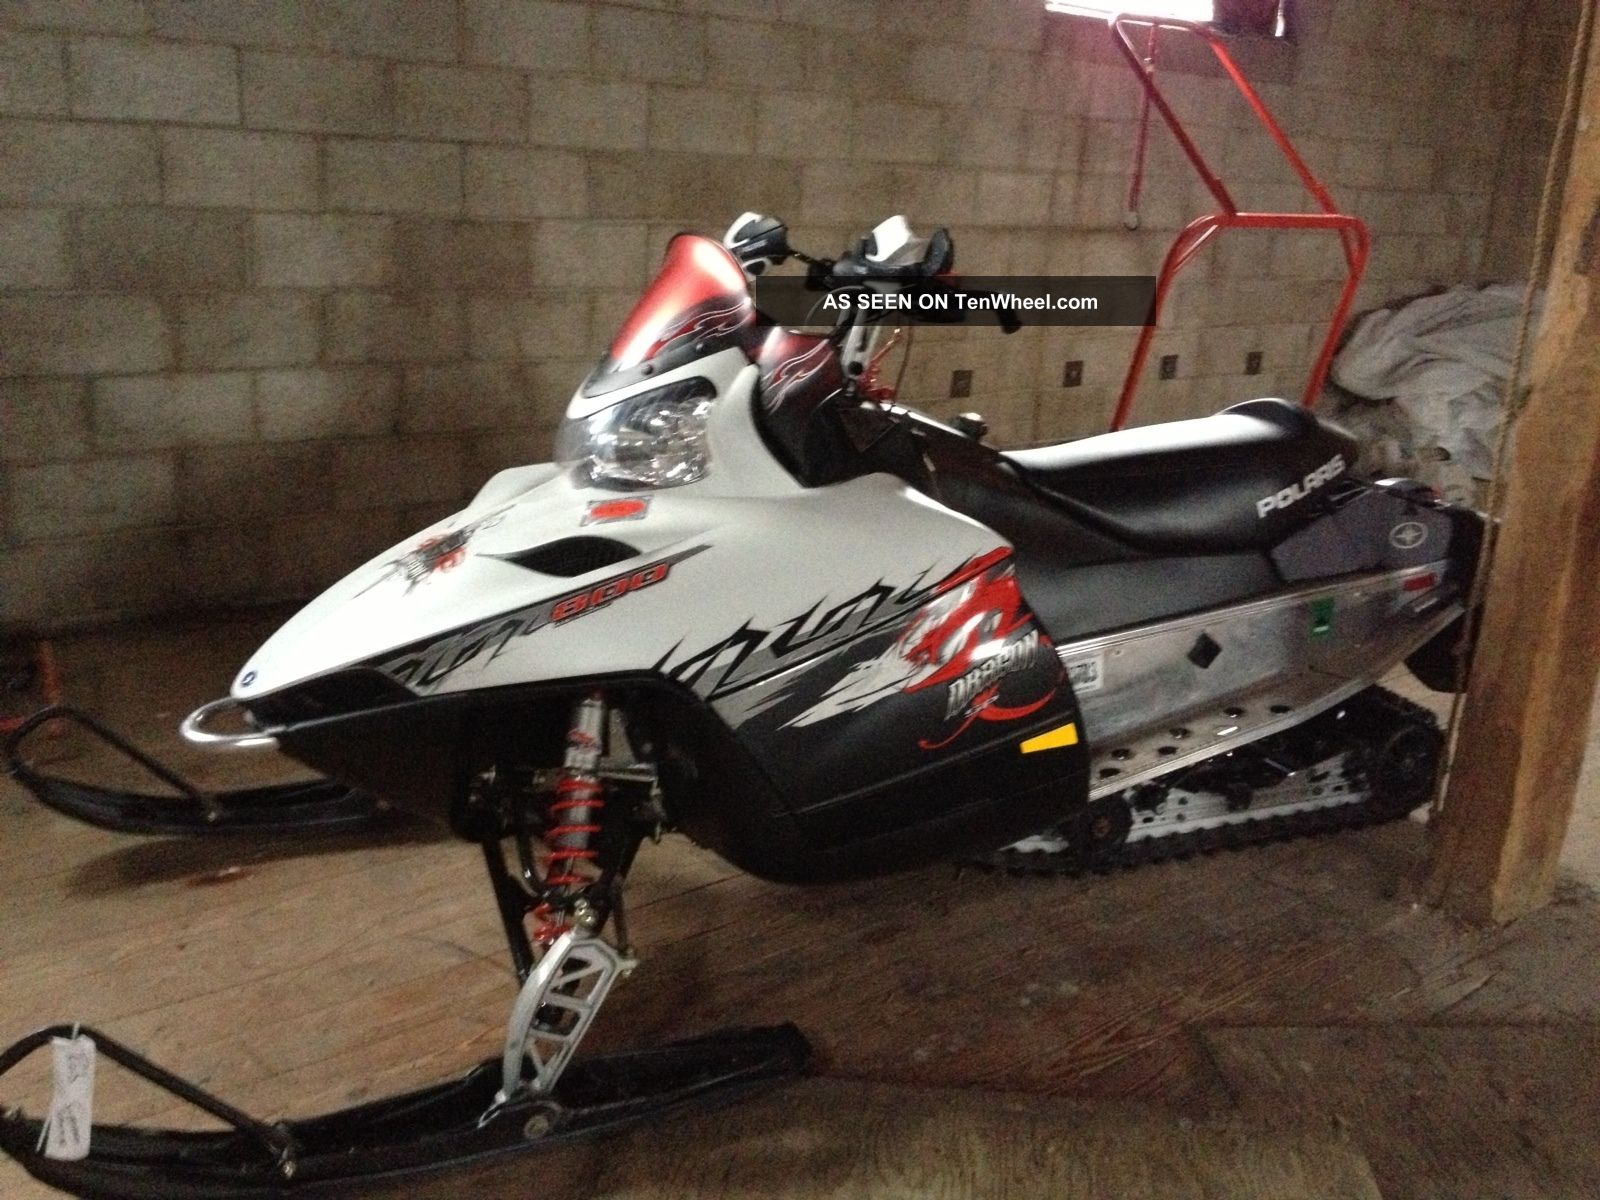 2009 Polaris Dragon 800 Sp